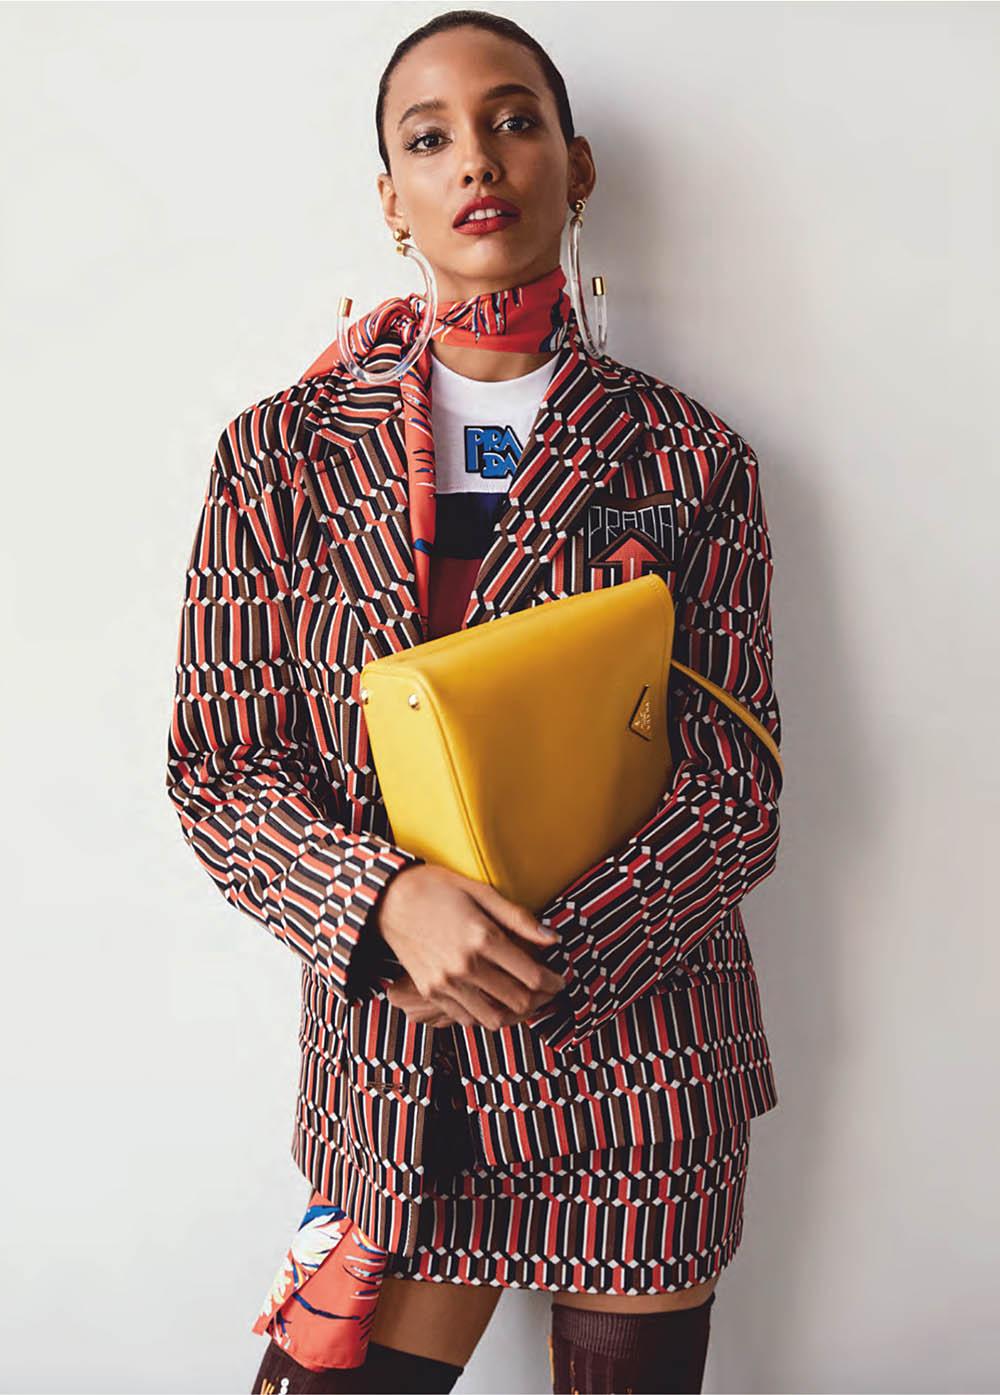 Cora Emmanuel by Owen Bruce for Elle Canada February 2019